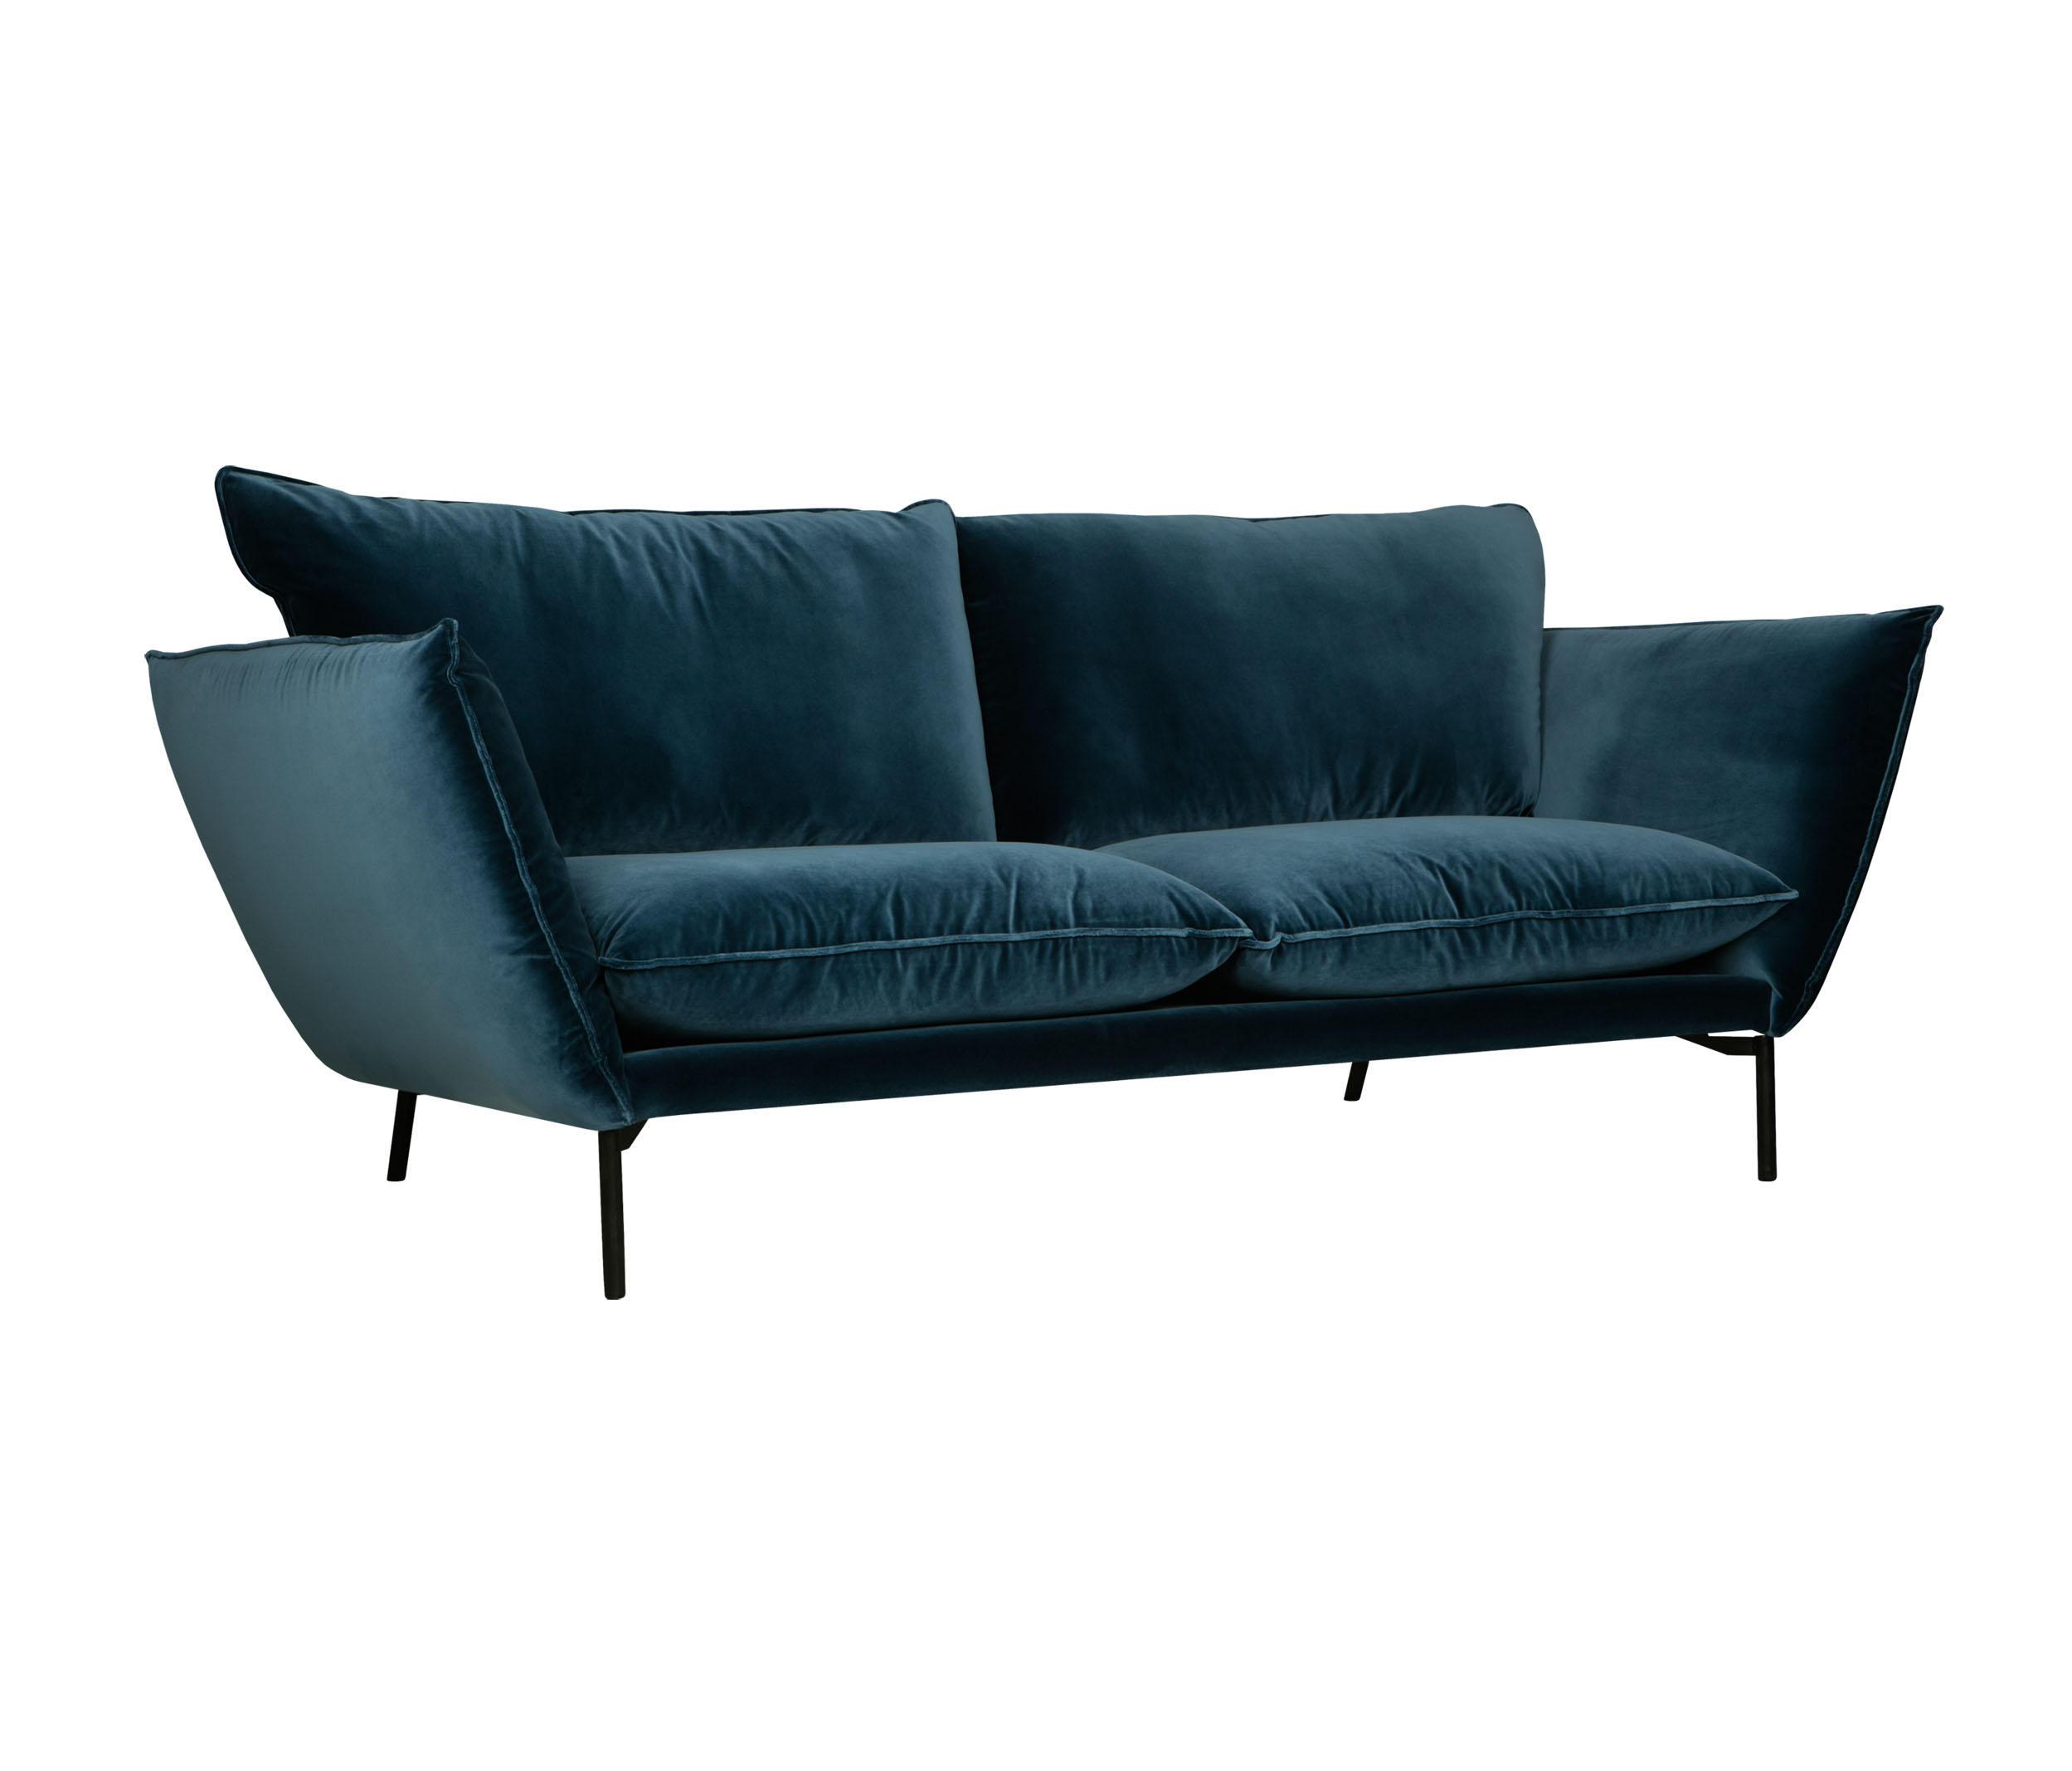 Merveilleux Hugo By SITS | Sofas Hugo By SITS | Sofas ...